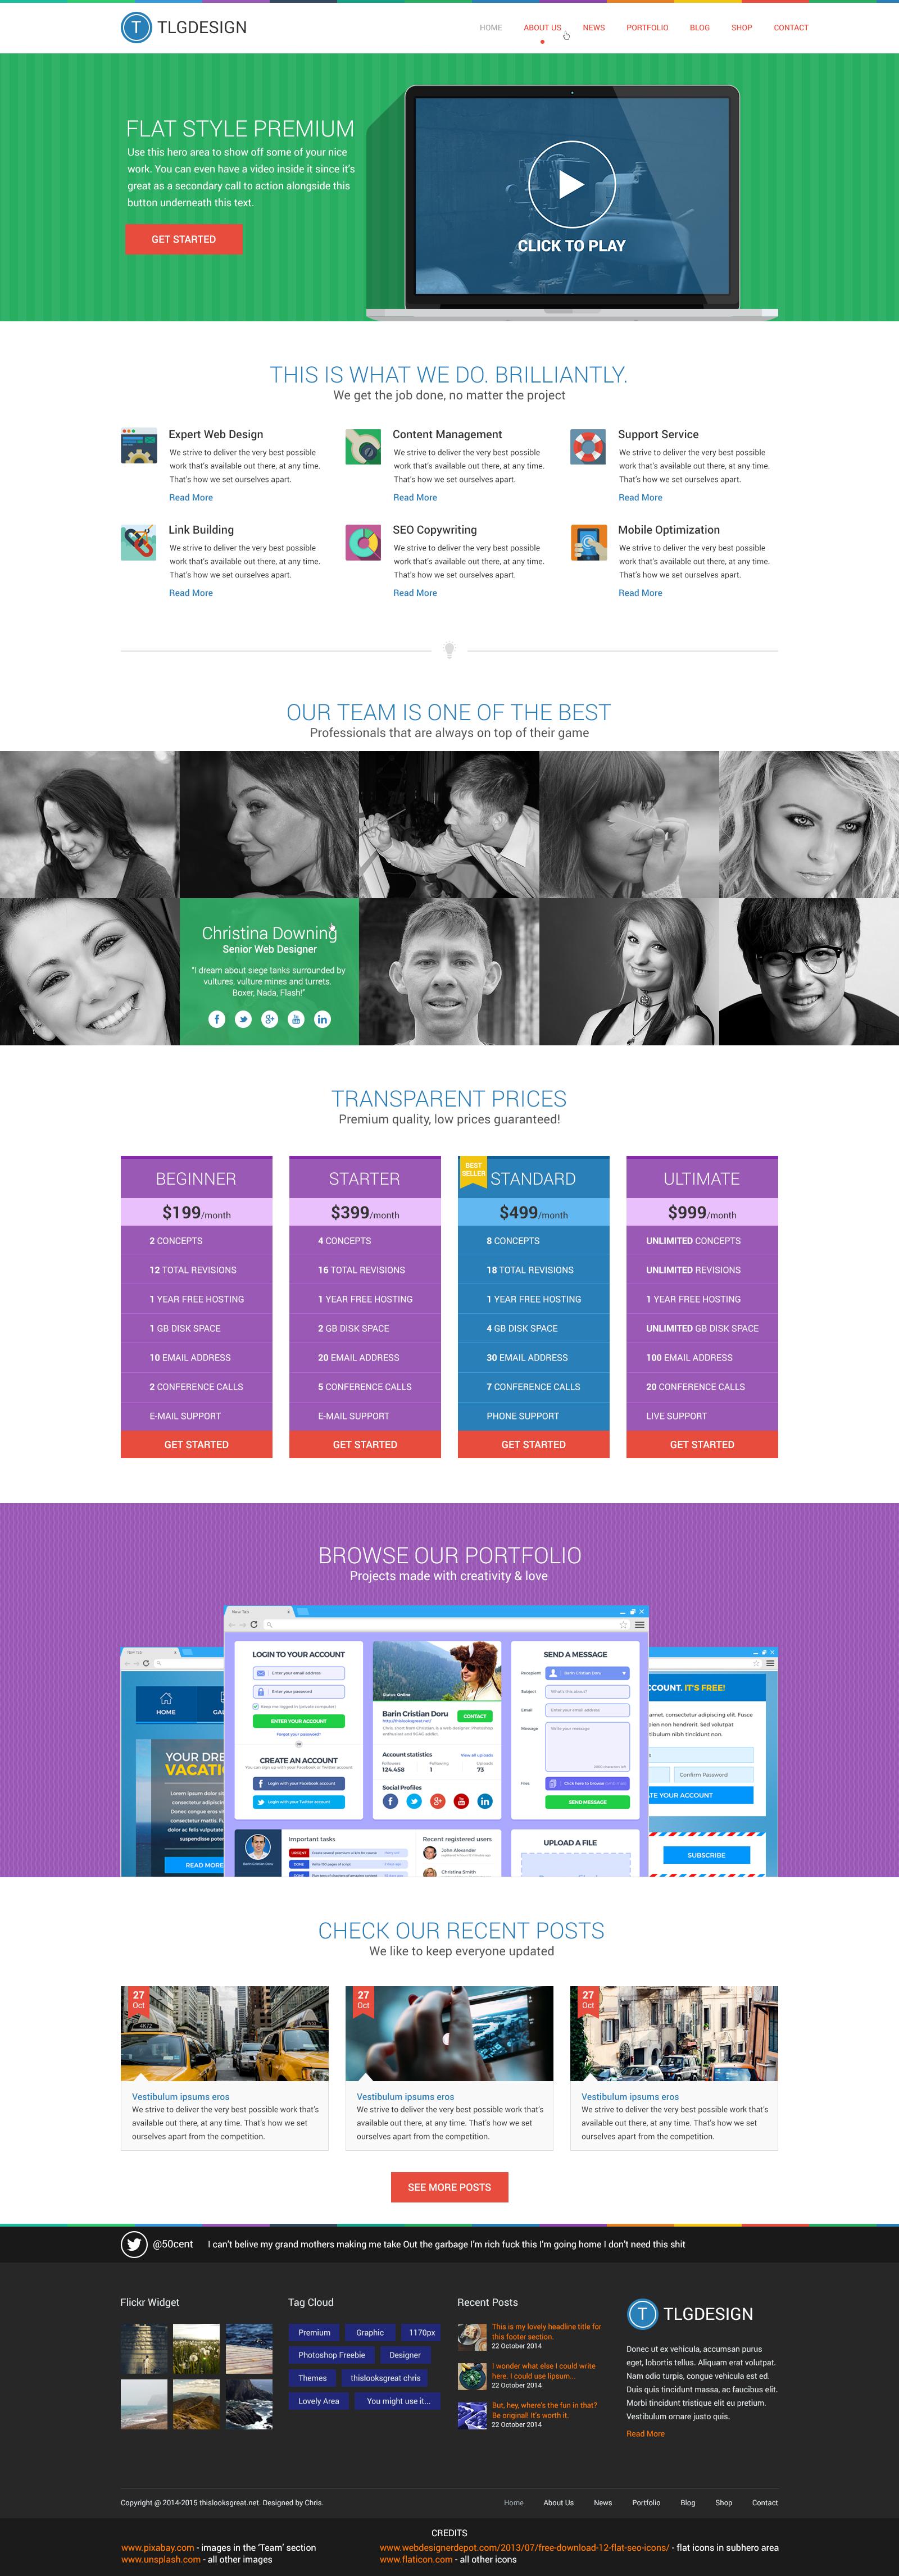 Flat Style Premium Homepage